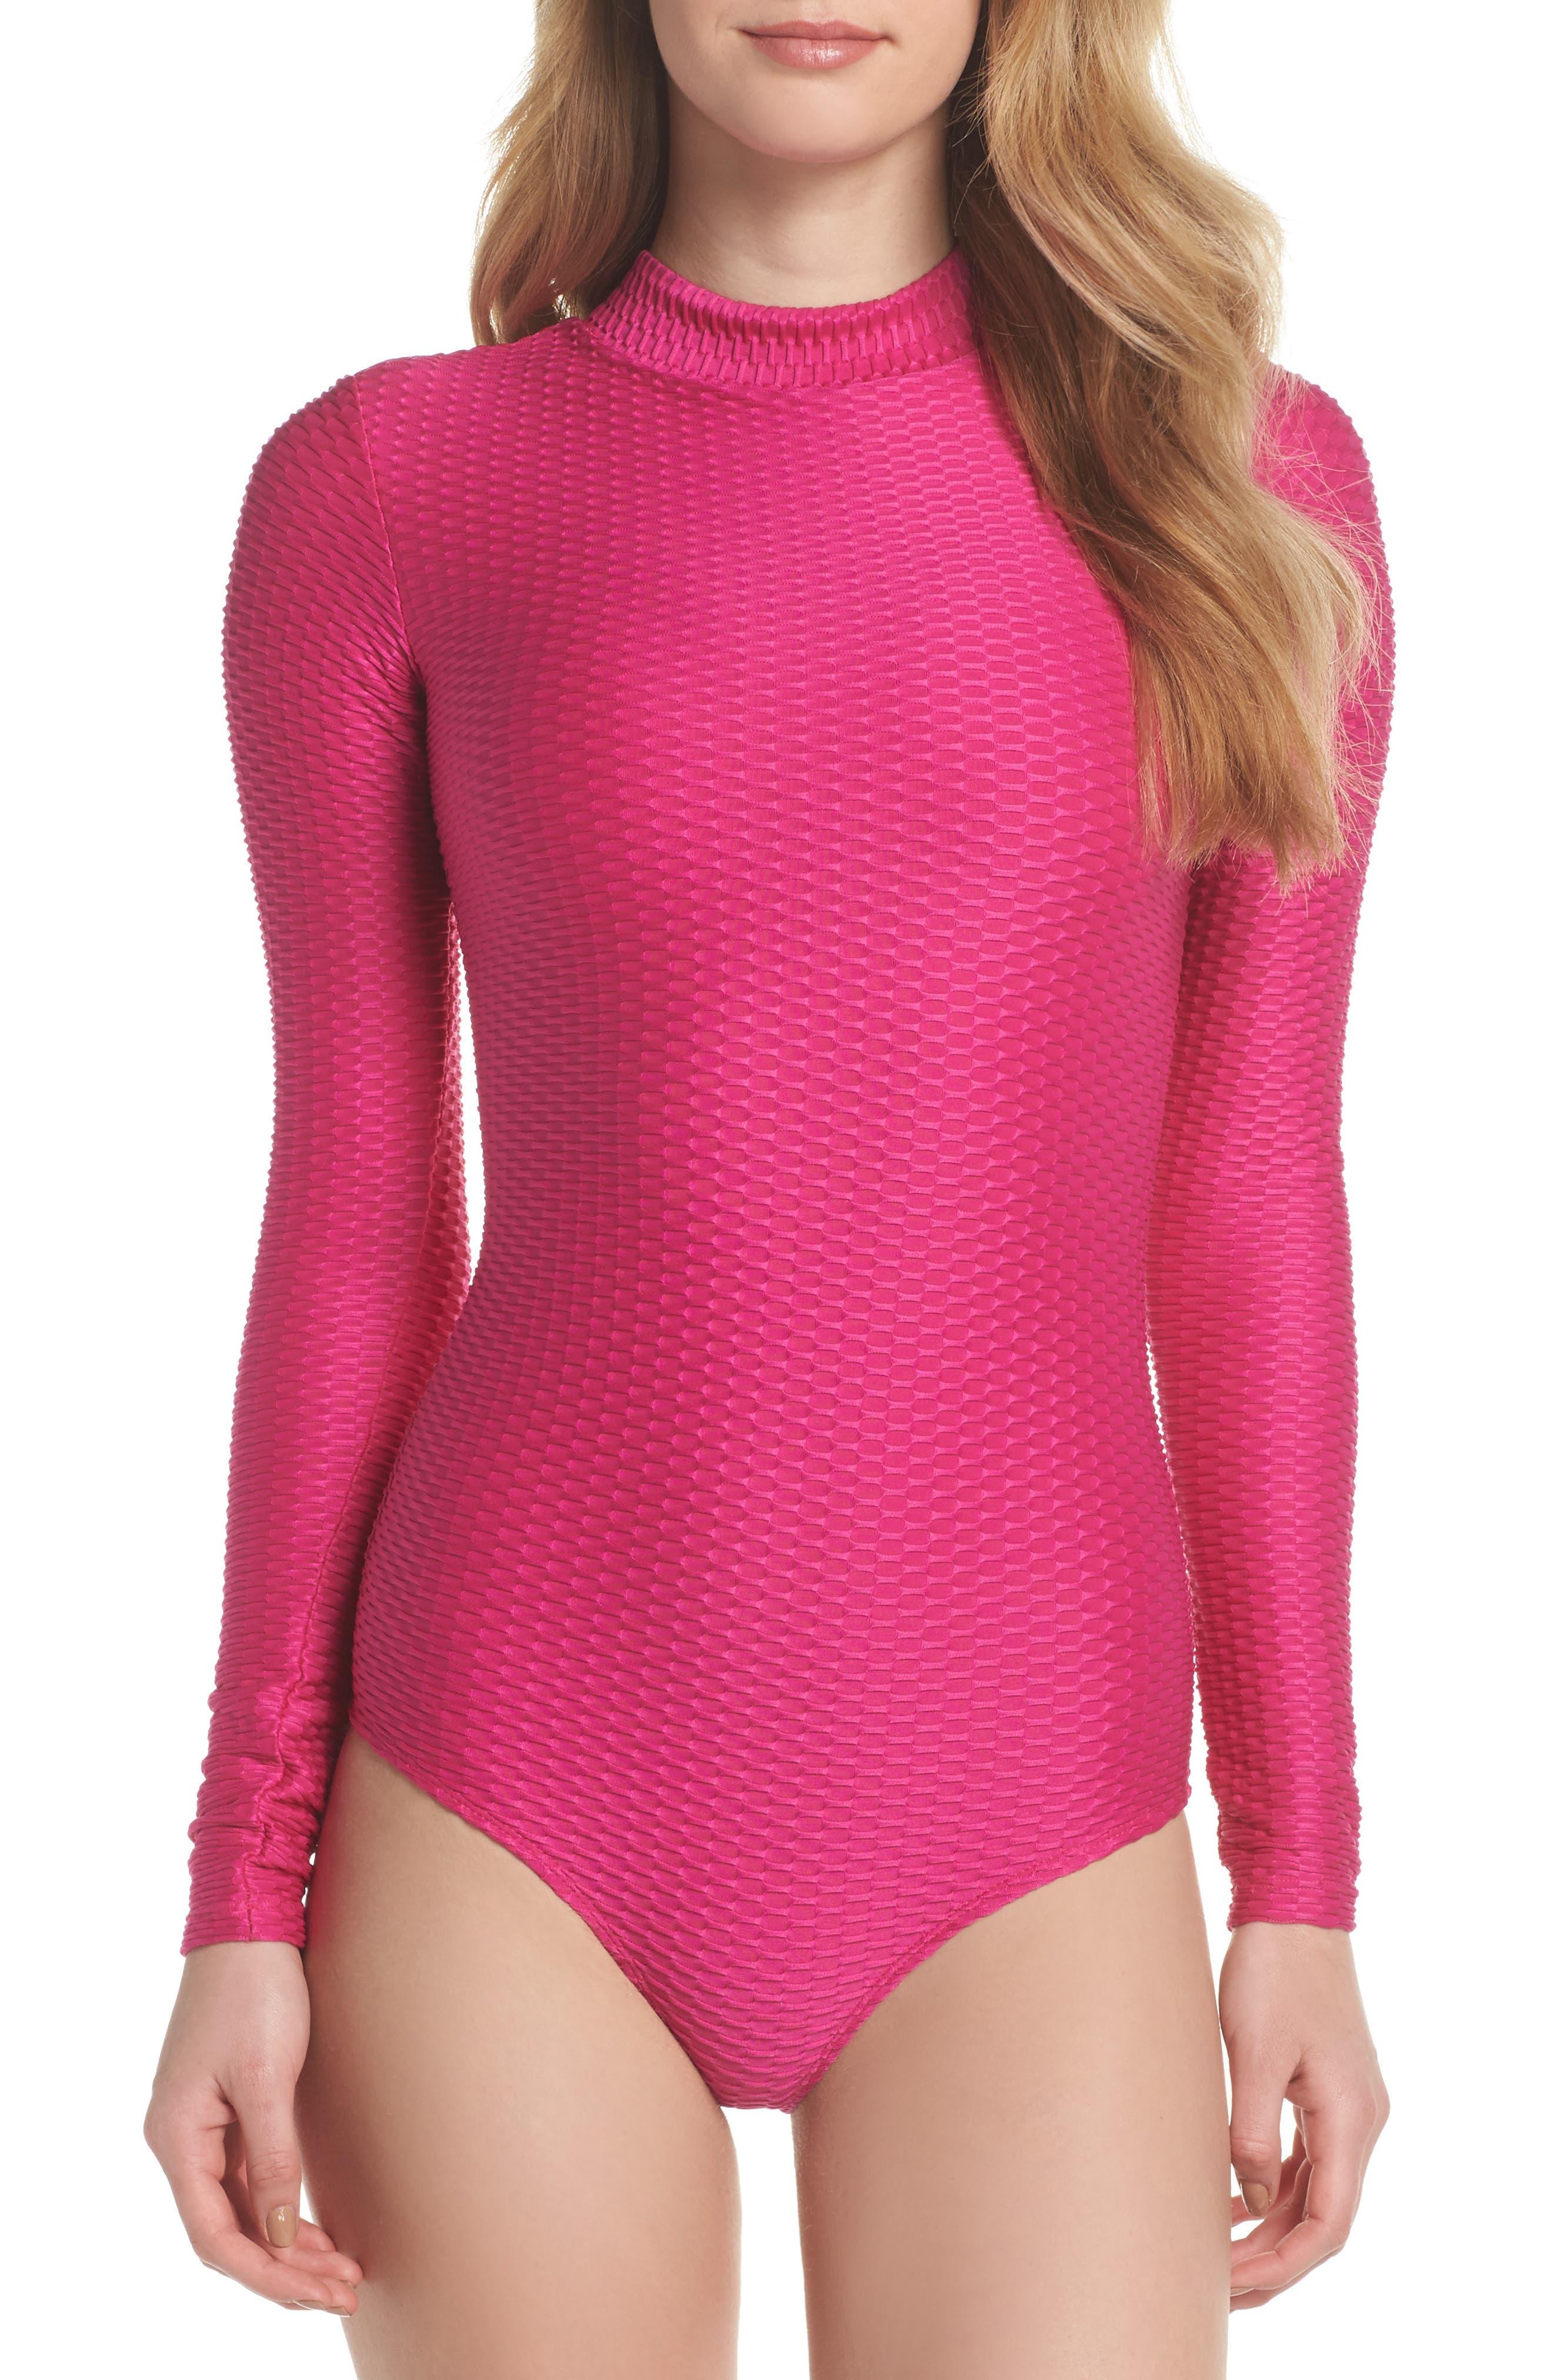 Long Sleeve One-Piece Swimsuit,                             Main thumbnail 1, color,                             Fuchsia